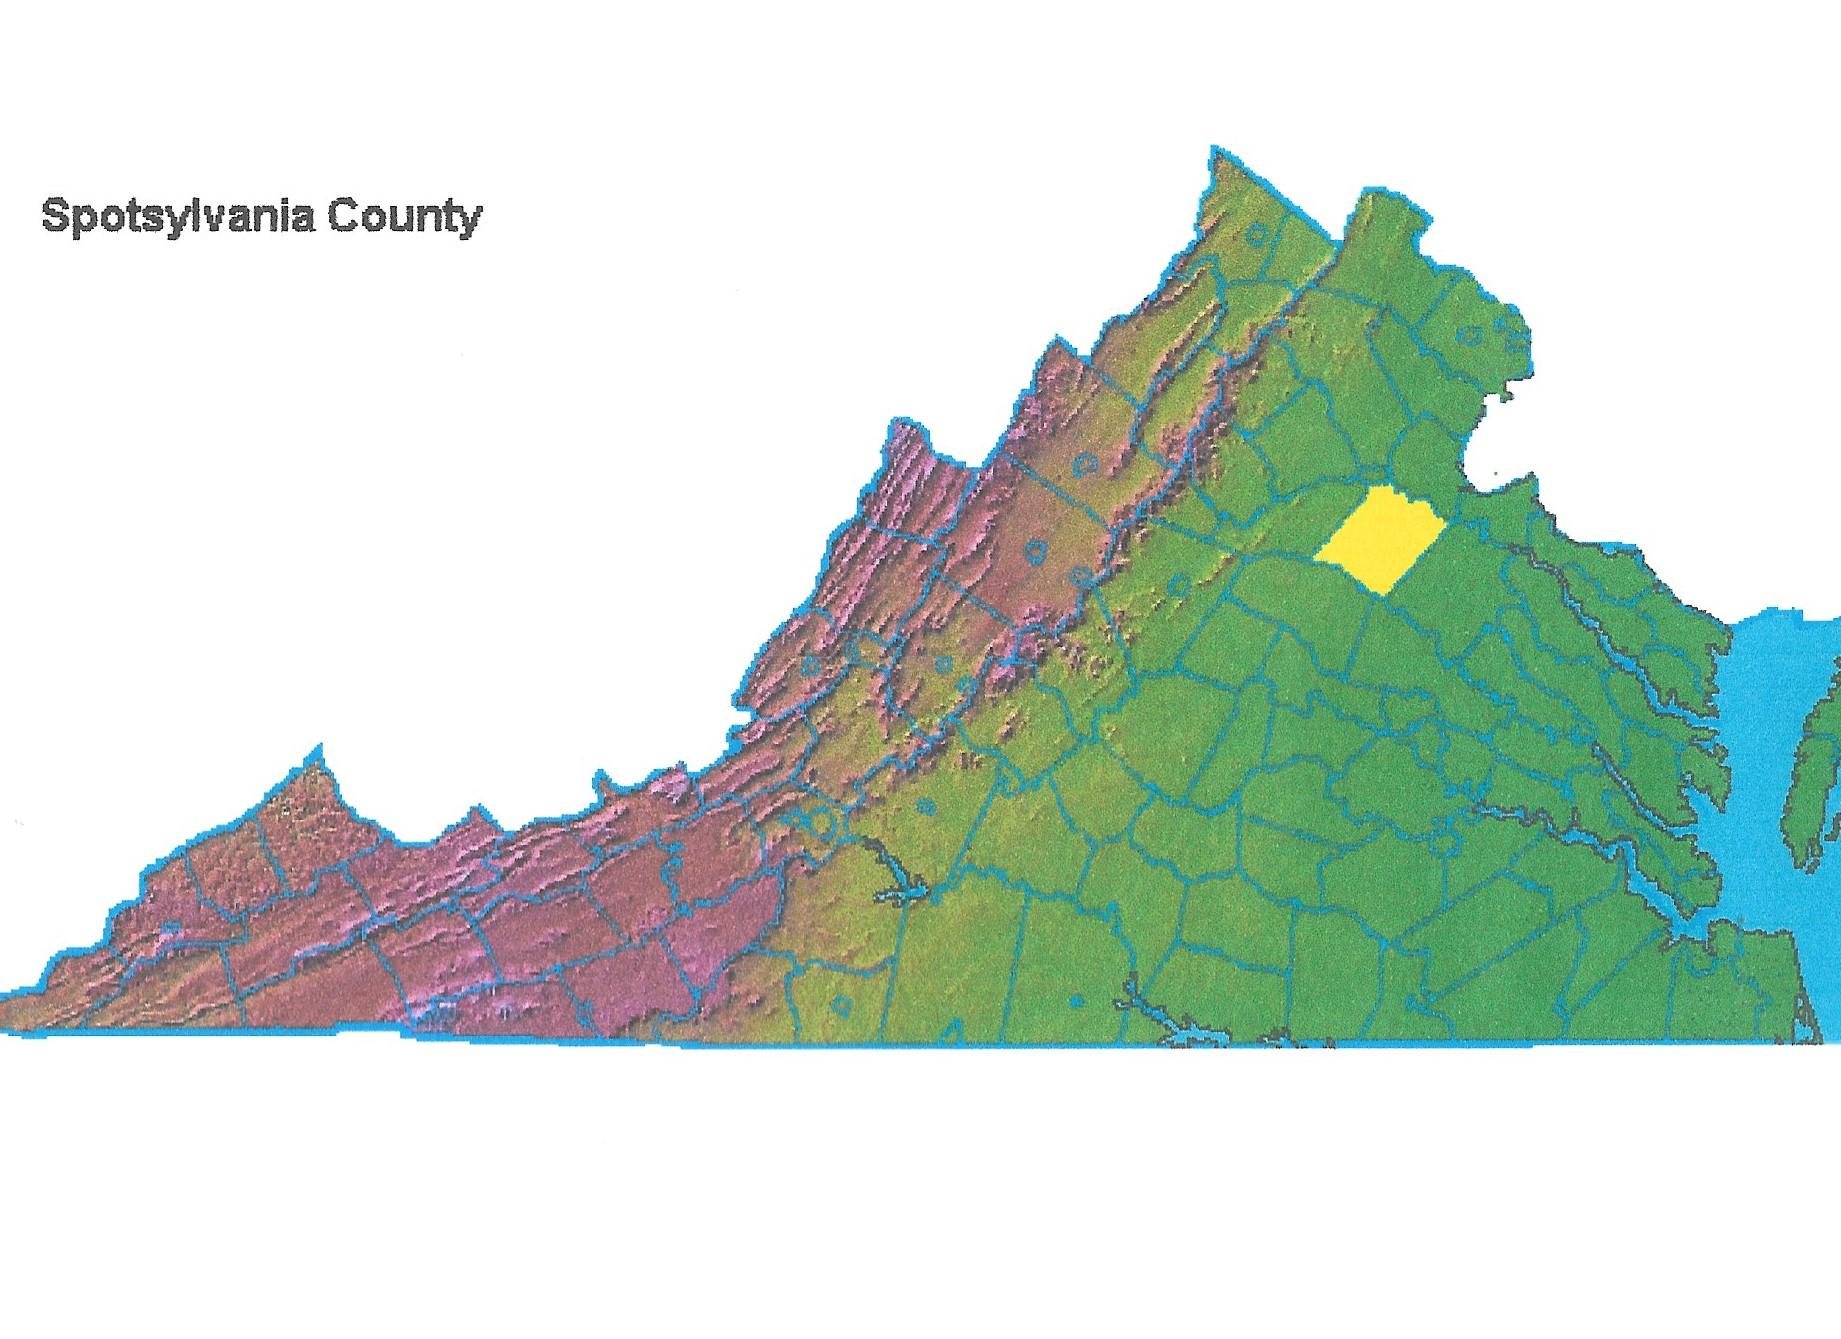 Virginia map and Spotsylvania Co., Taliaferro, John 001